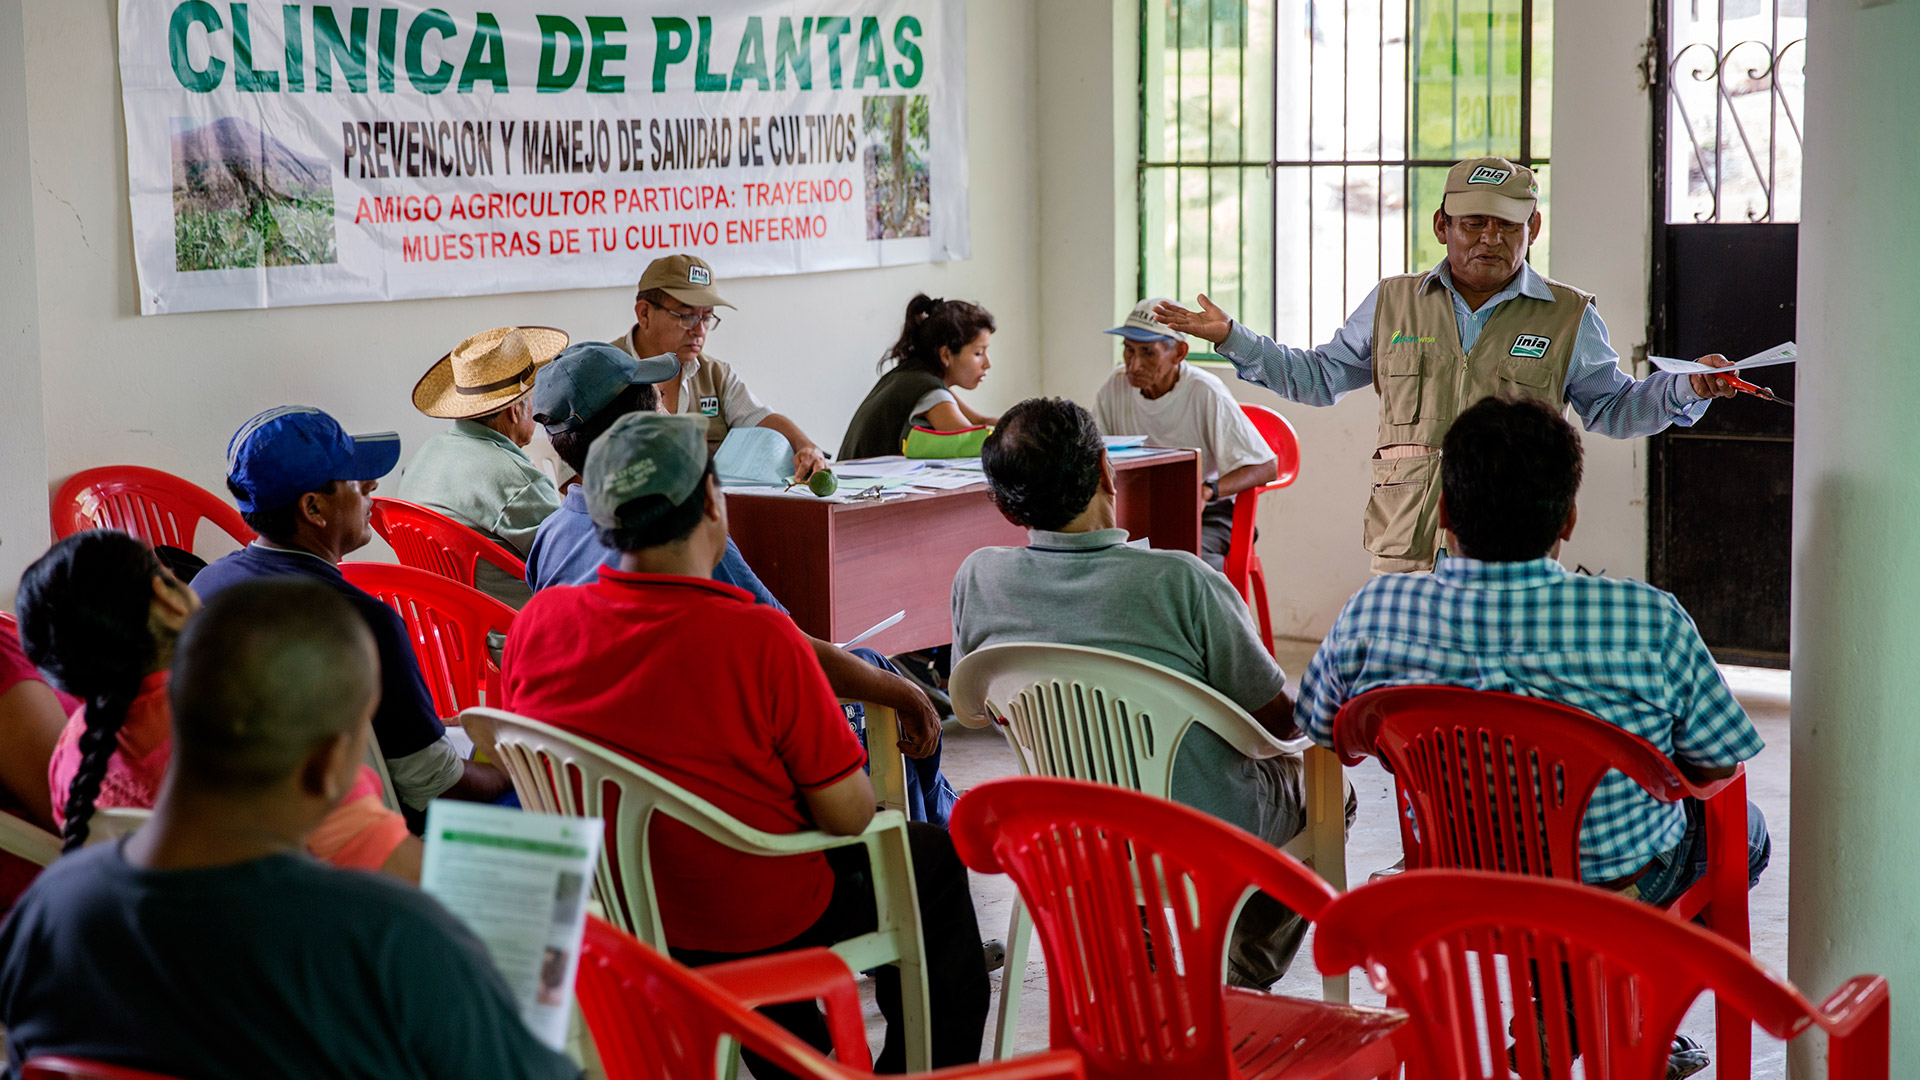 Farmers attending a plant clinic in Peru